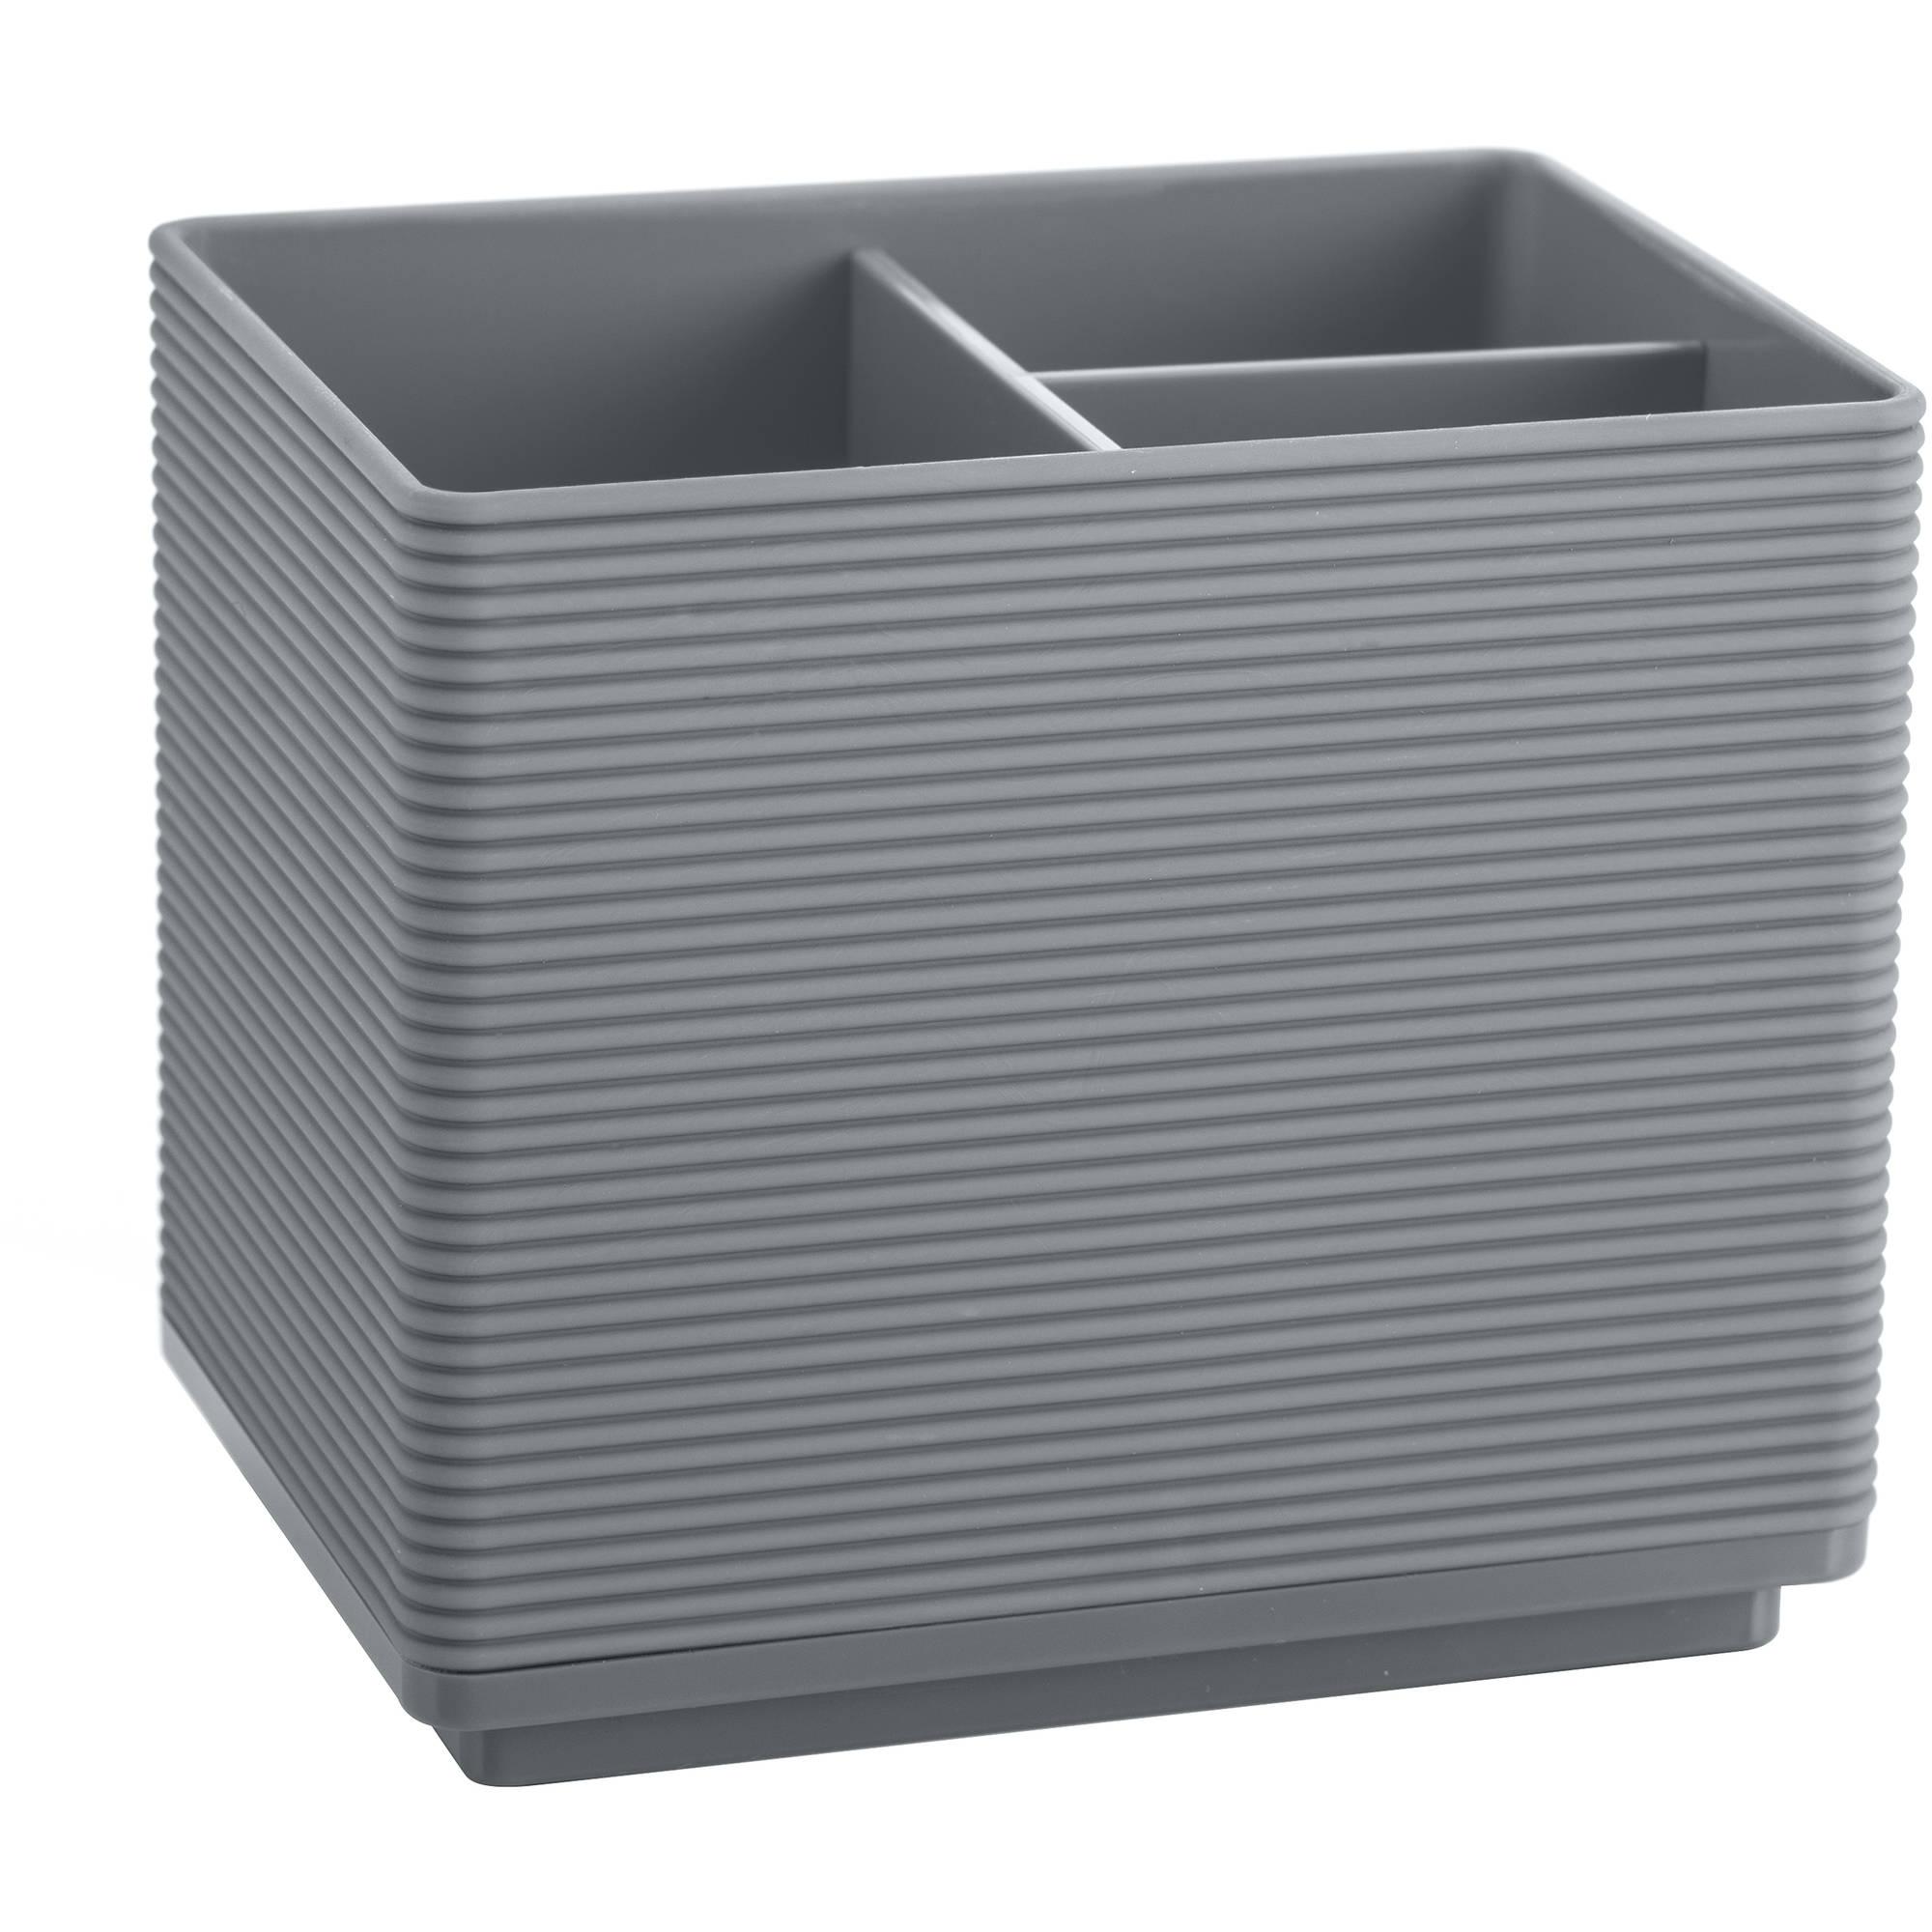 Mainstays Soft Touch Grey Organizer